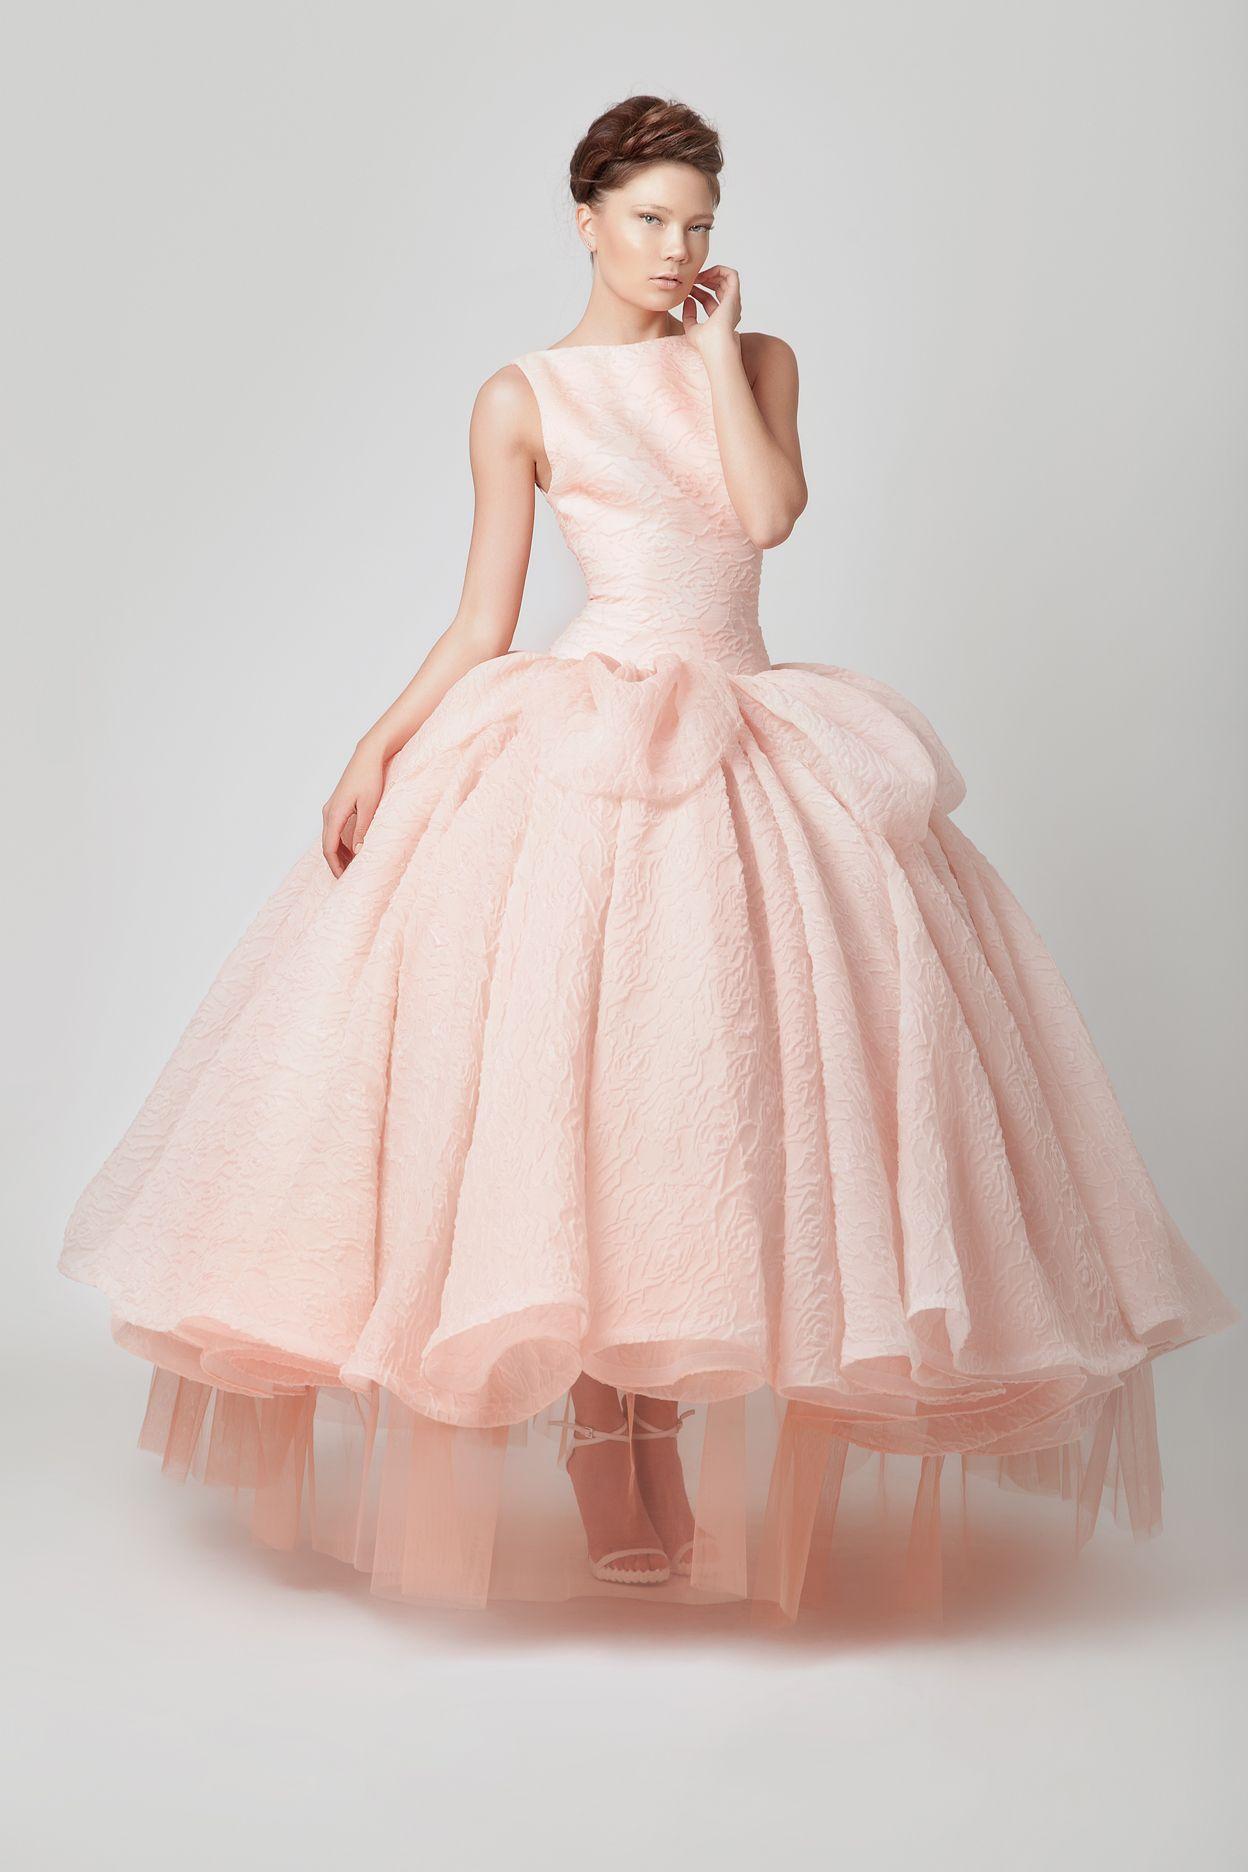 2015 Vestidos Bateau Sleeveless Evening Dresses Seersucker A Line ...